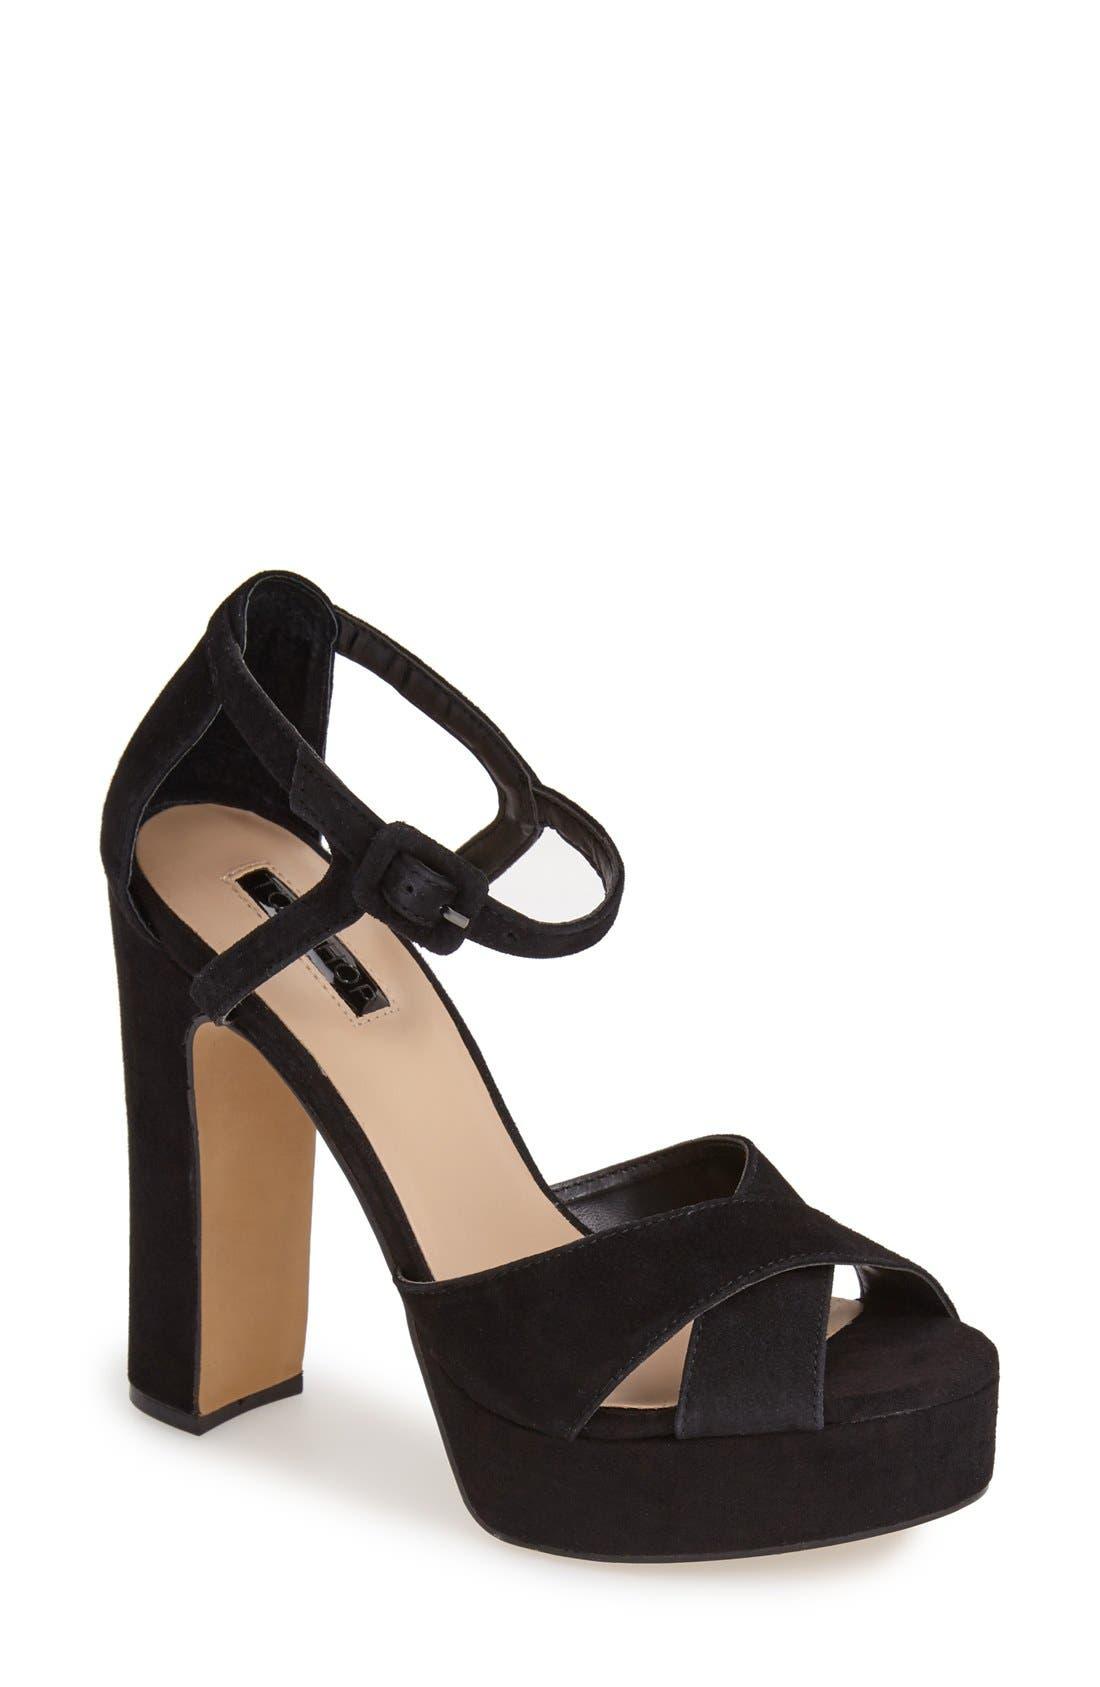 Alternate Image 1 Selected - Topshop 'Locket' Platform Suede Sandal (Women)